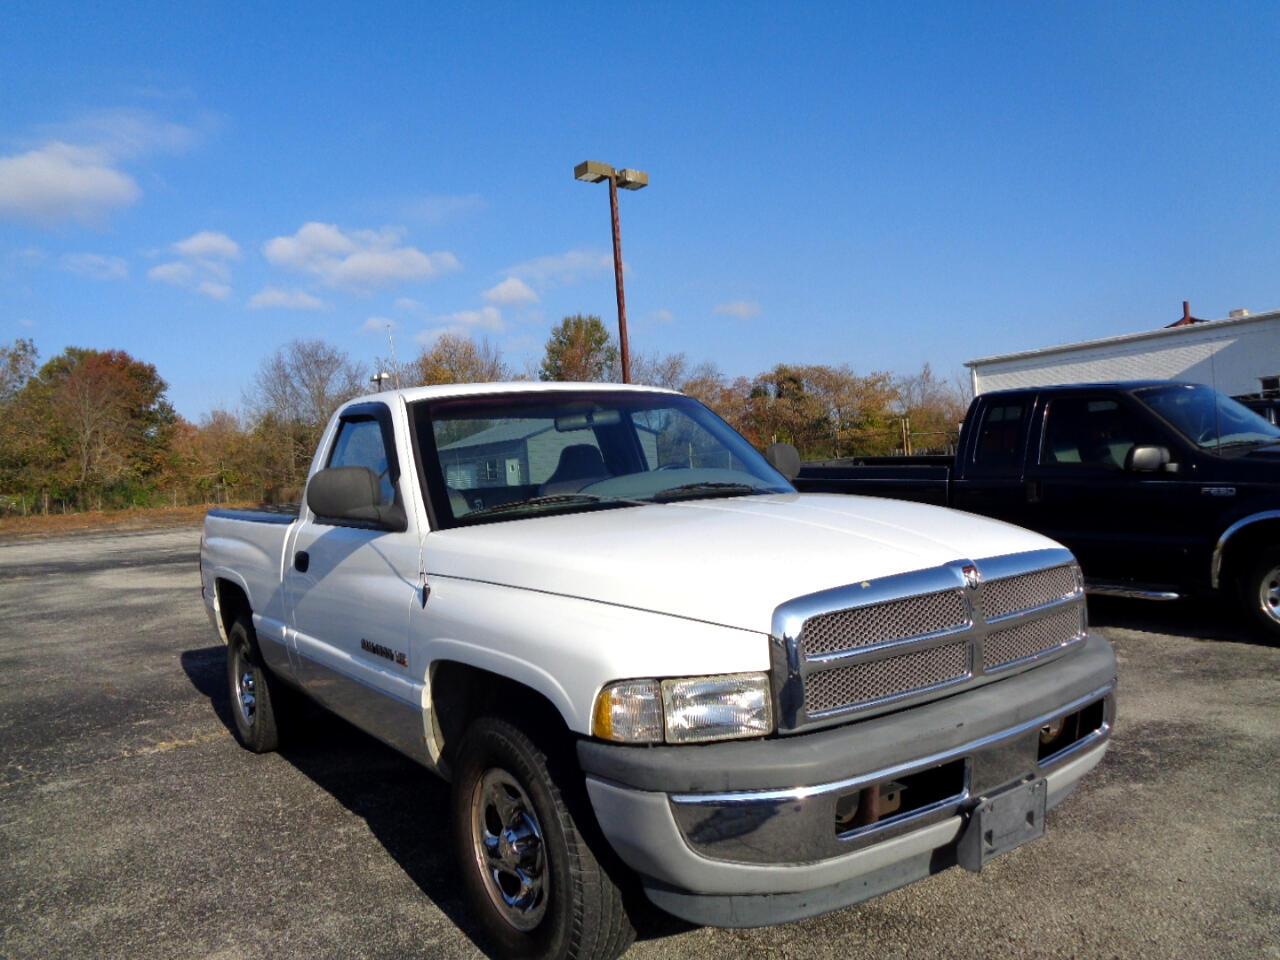 "2001 Dodge Ram 1500 2dr Reg Cab 119"" WB Work Special"